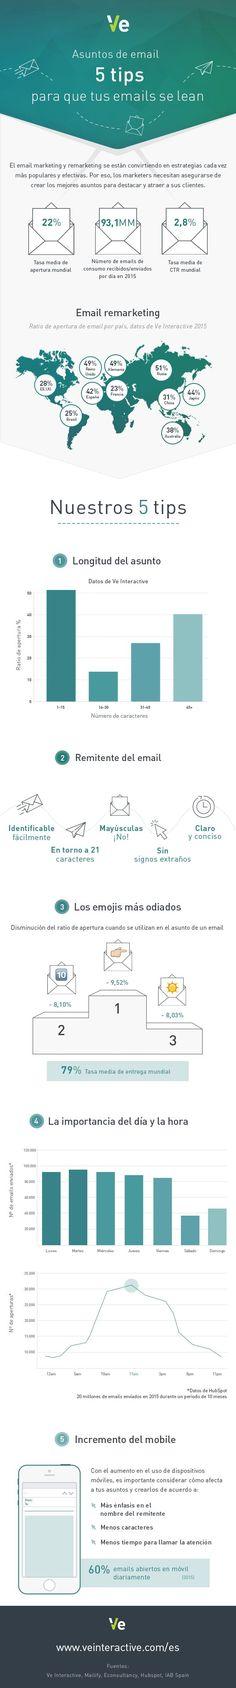 #emailmarketingsoftware #emailmarketingtips #affiliateproductreview #emailmrketingtools #AutoBlogGridThemeReview